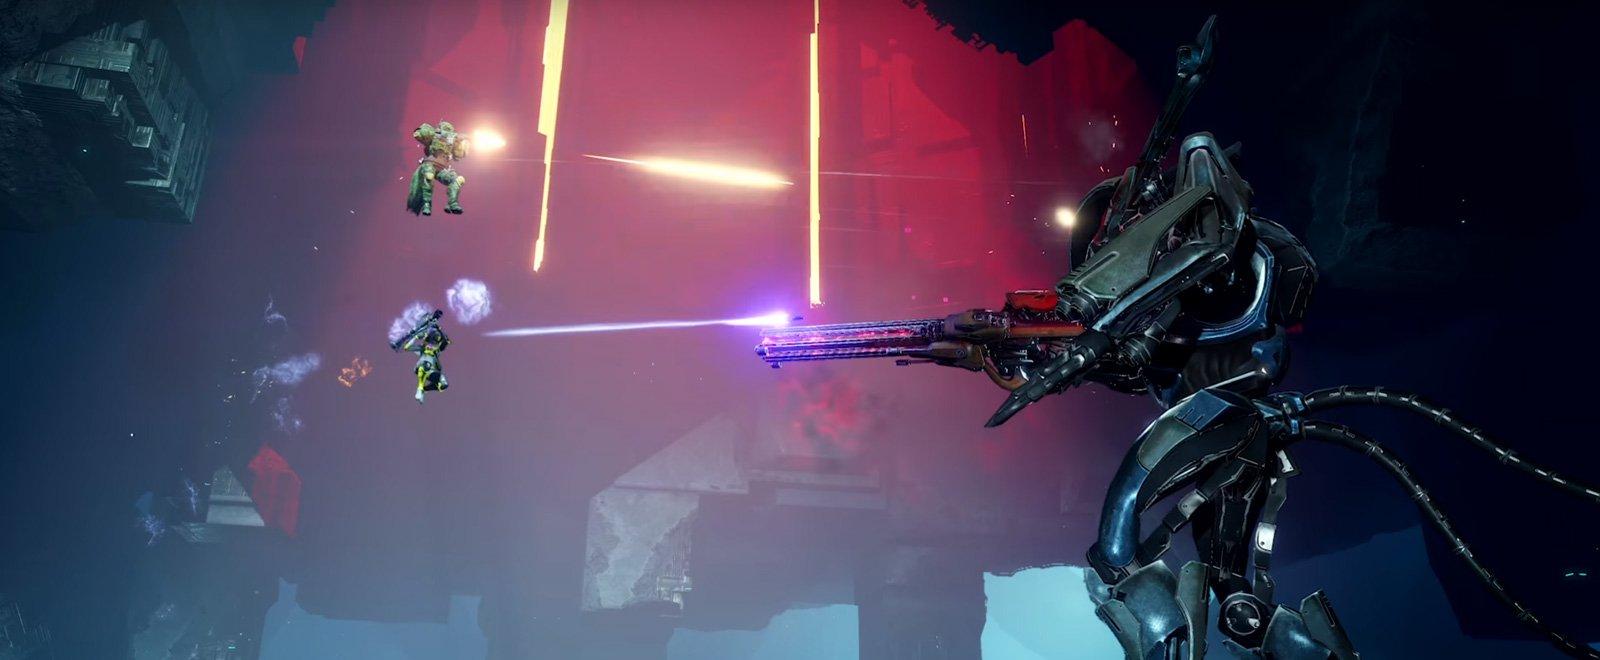 Destiny 2 Screenshot 18